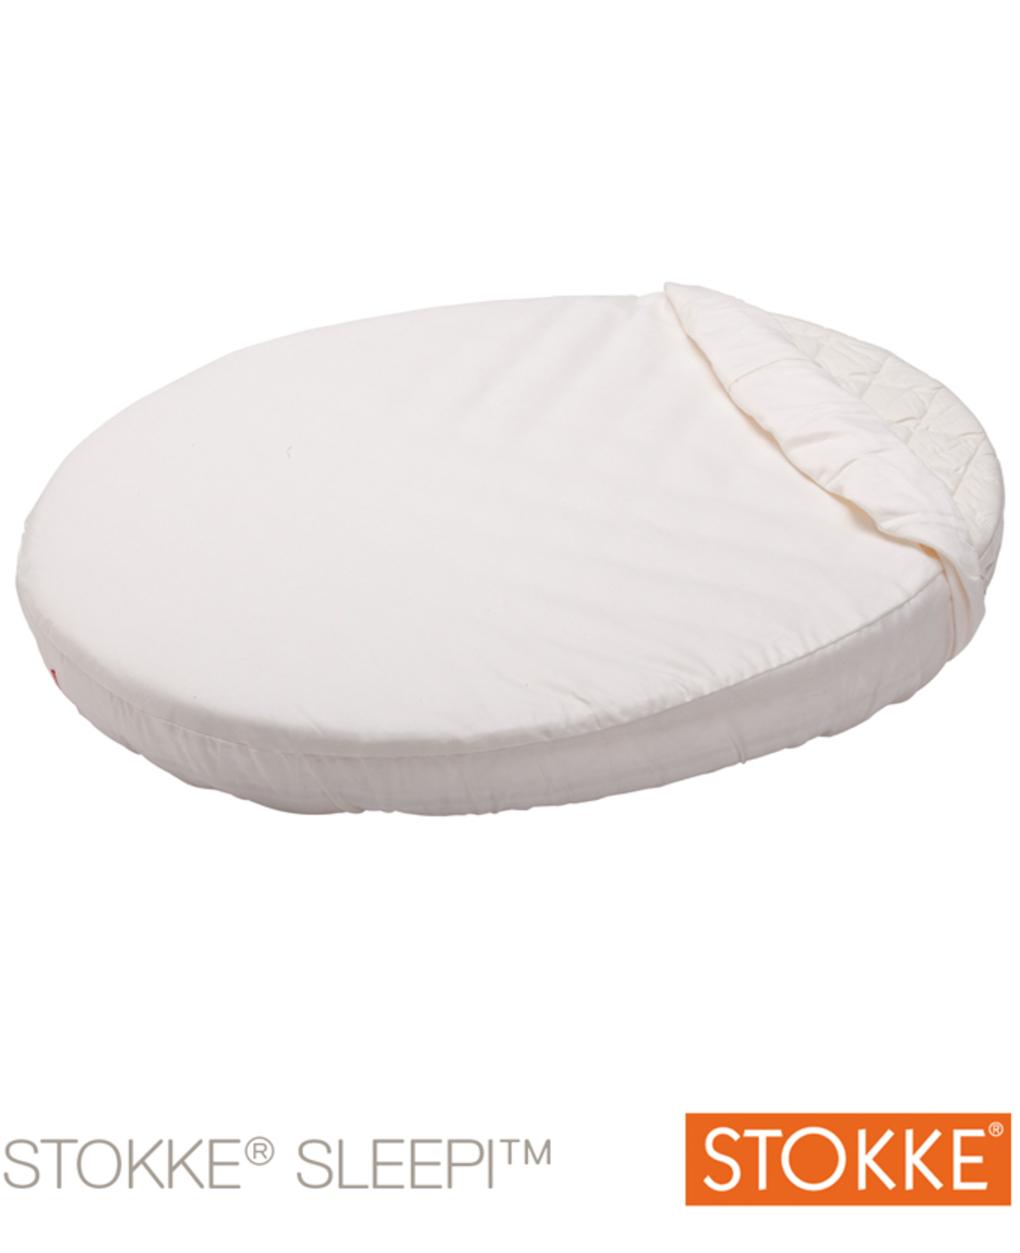 Lençol branco ajustável stokke® sleepi ™ baby - Stokke